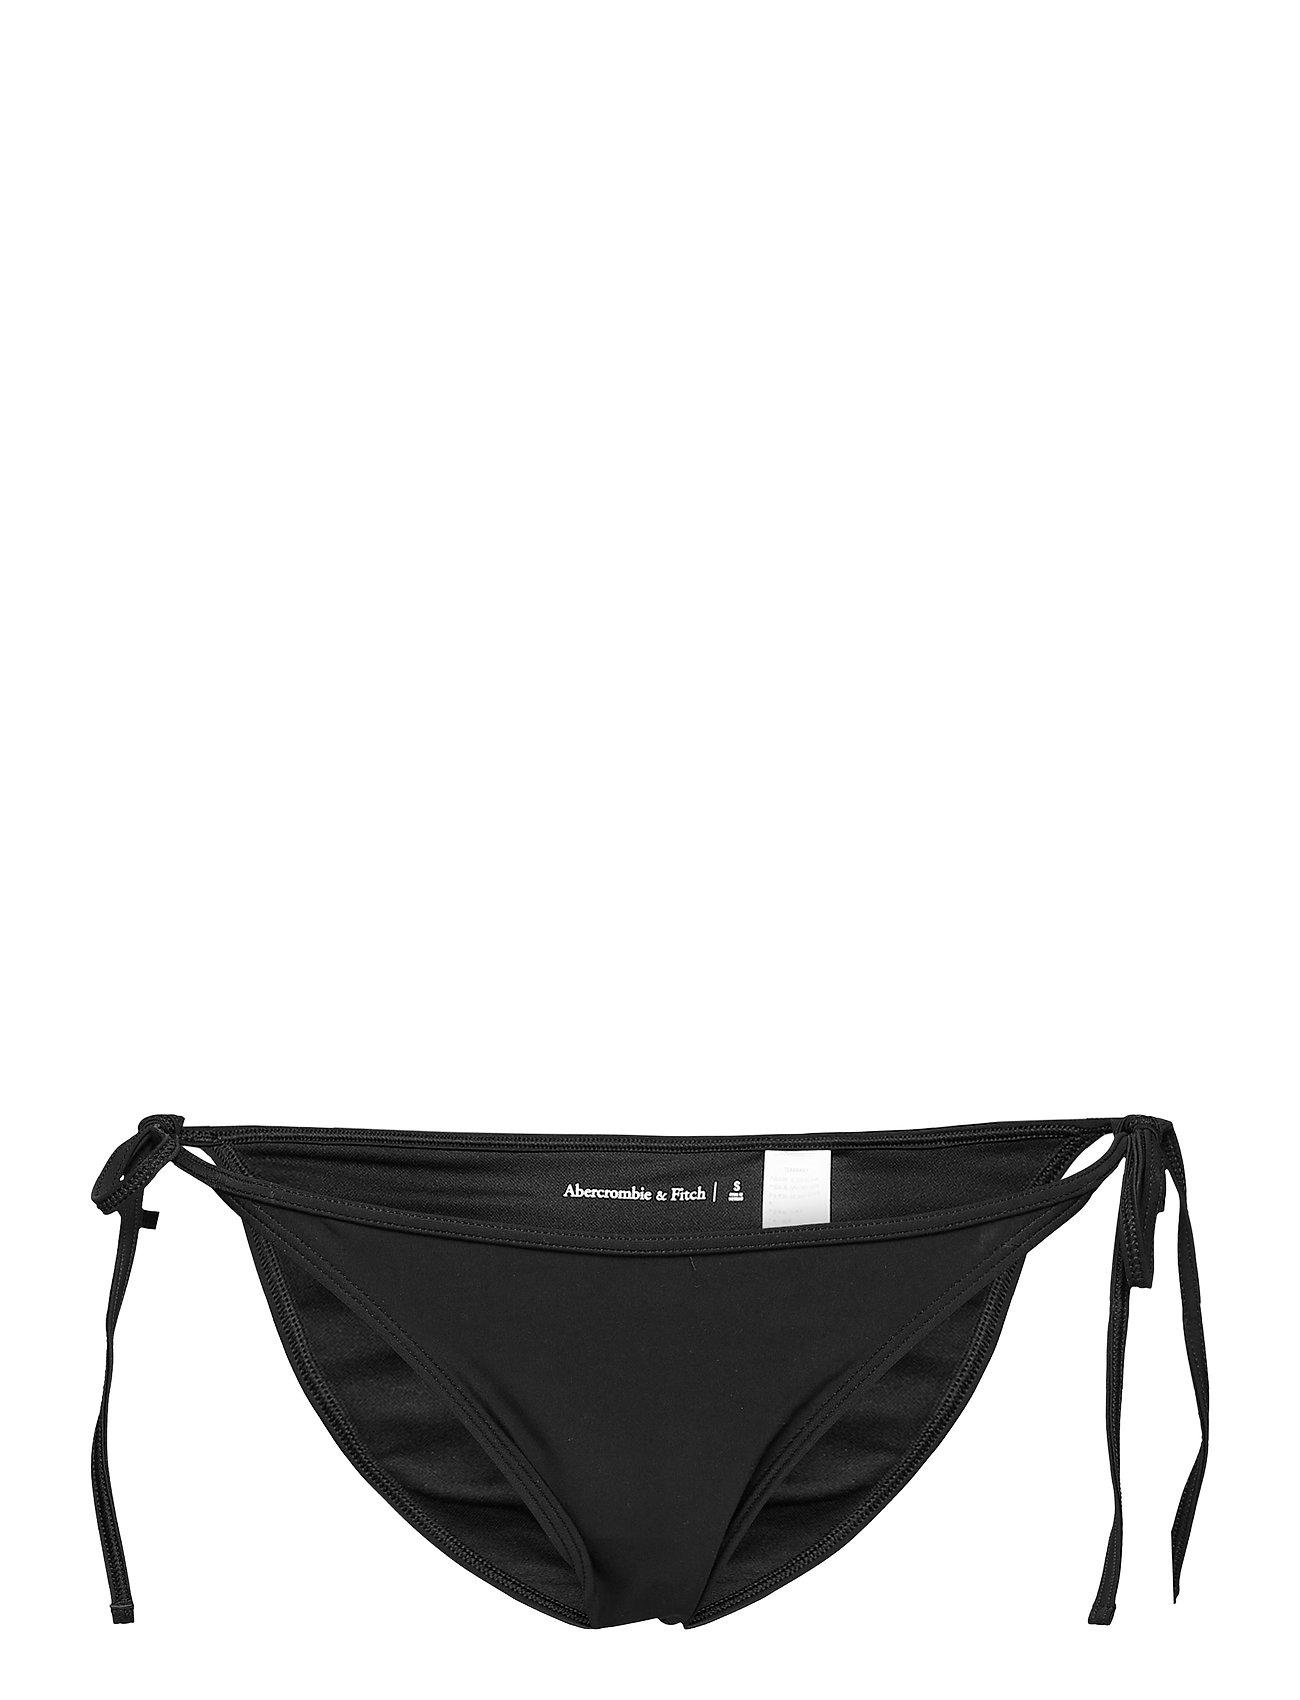 Anf Womens Swim Bikinitrusser Sort Abercrombie & Fitch